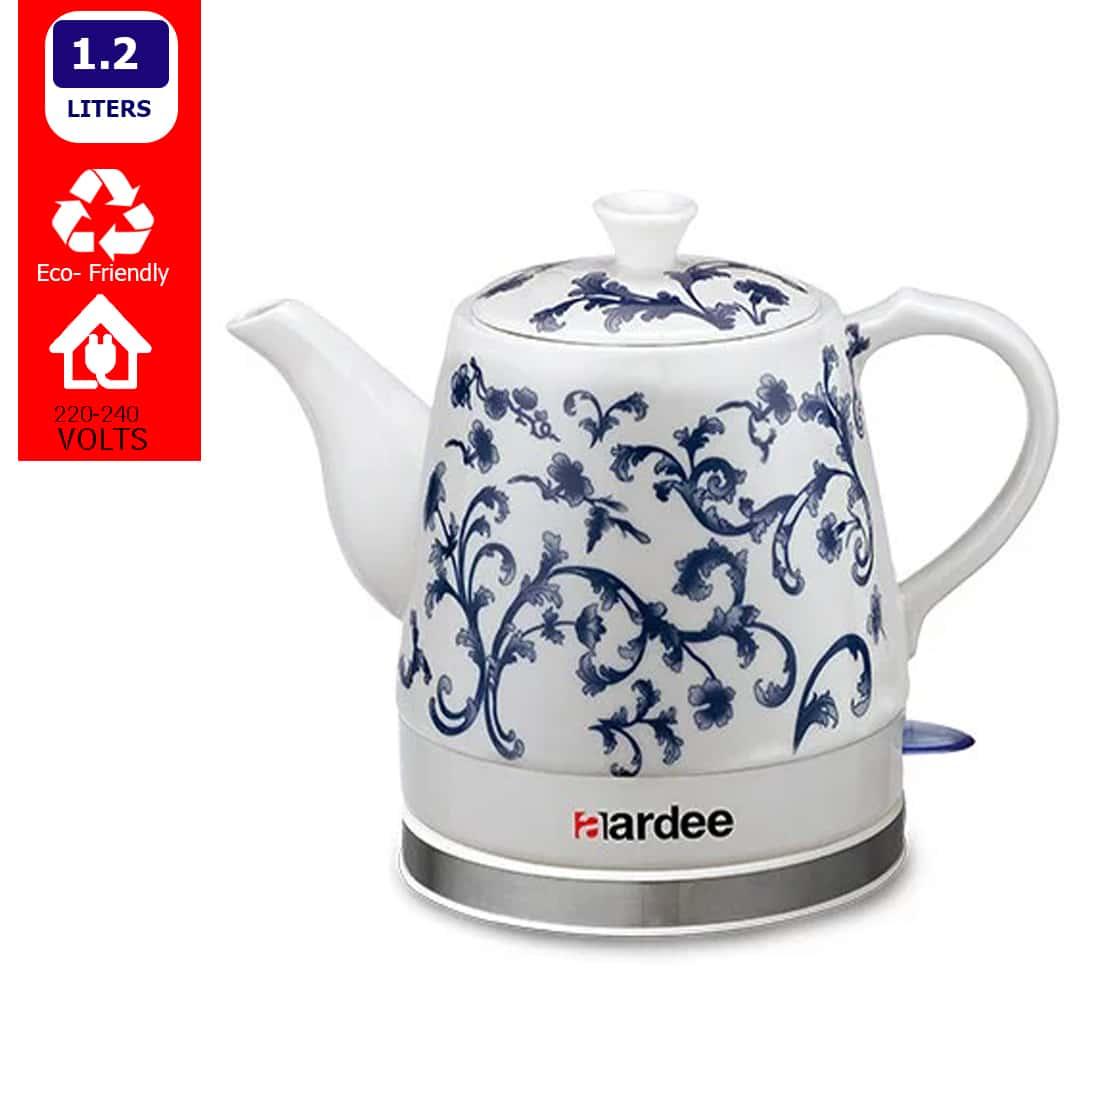 Aardee-Ceramic-kettle-12-Elegant-kettle